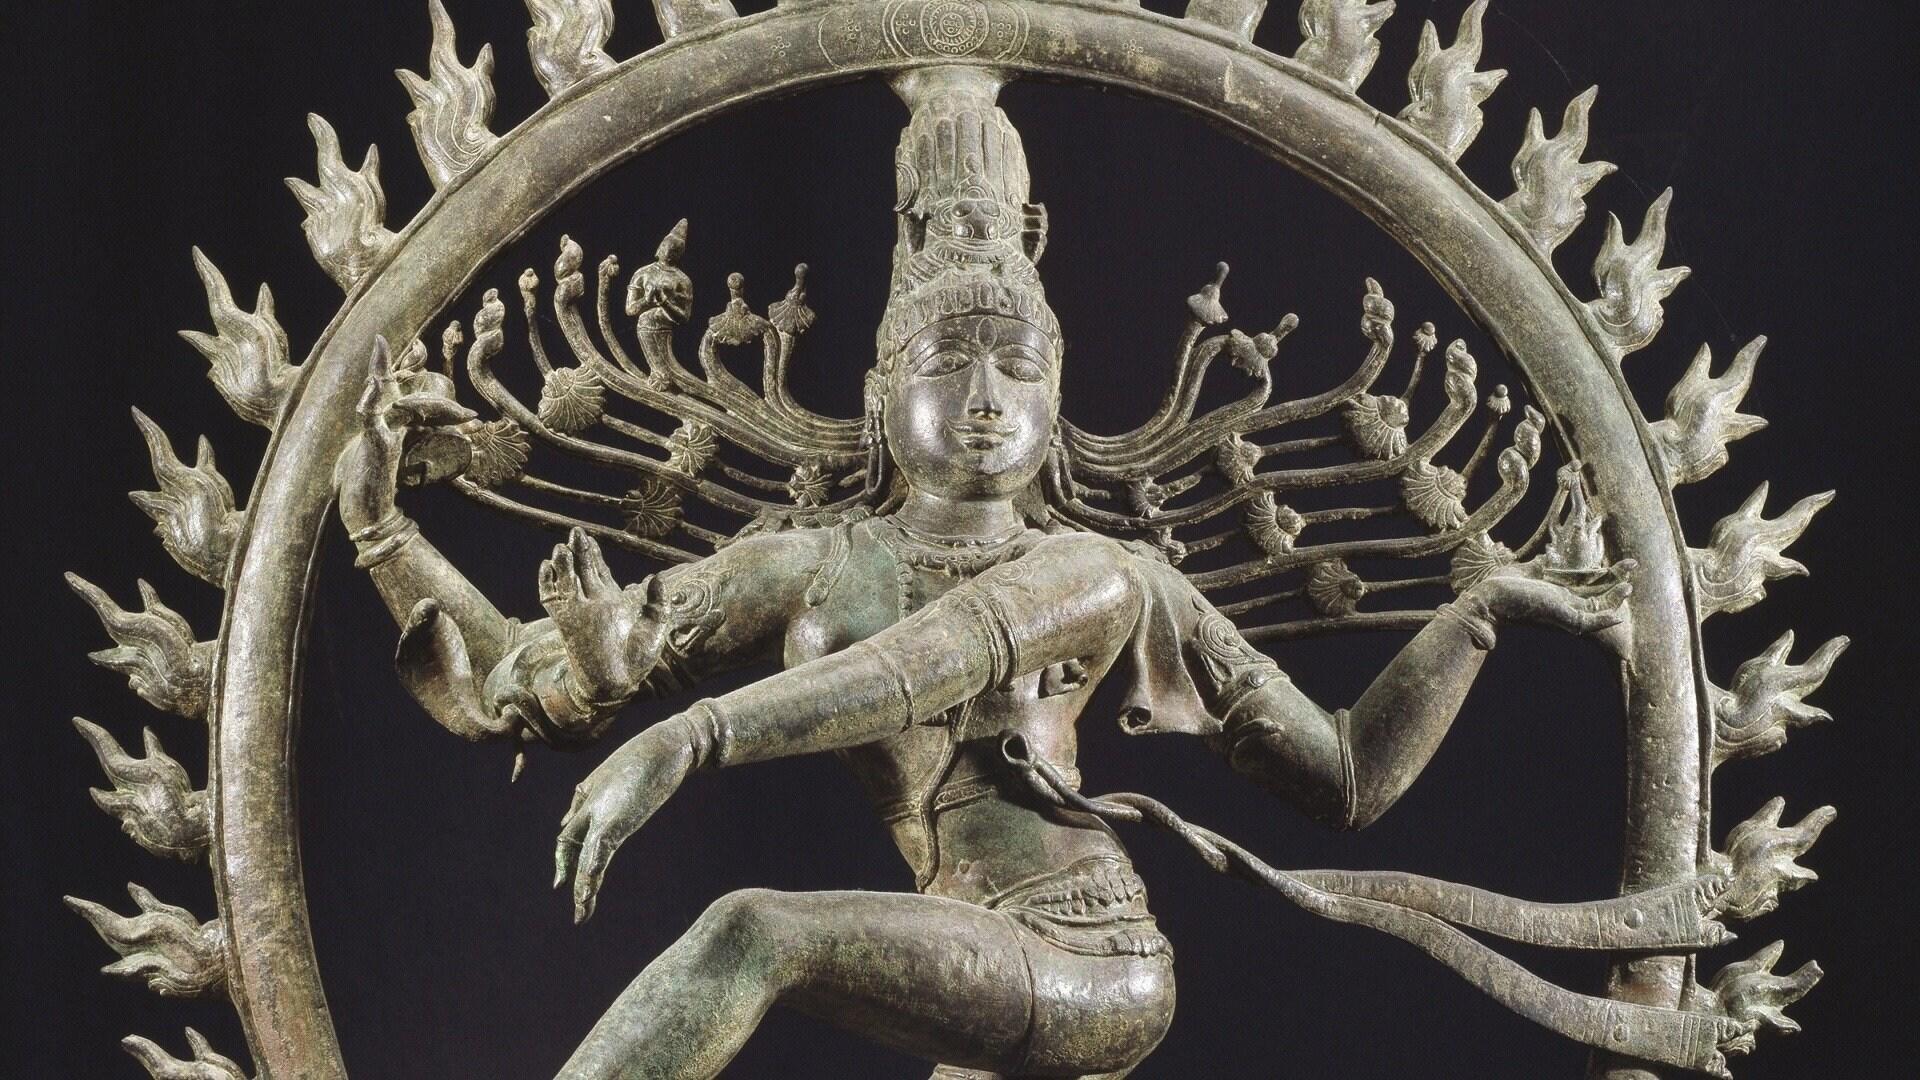 Shiva the Destroyer